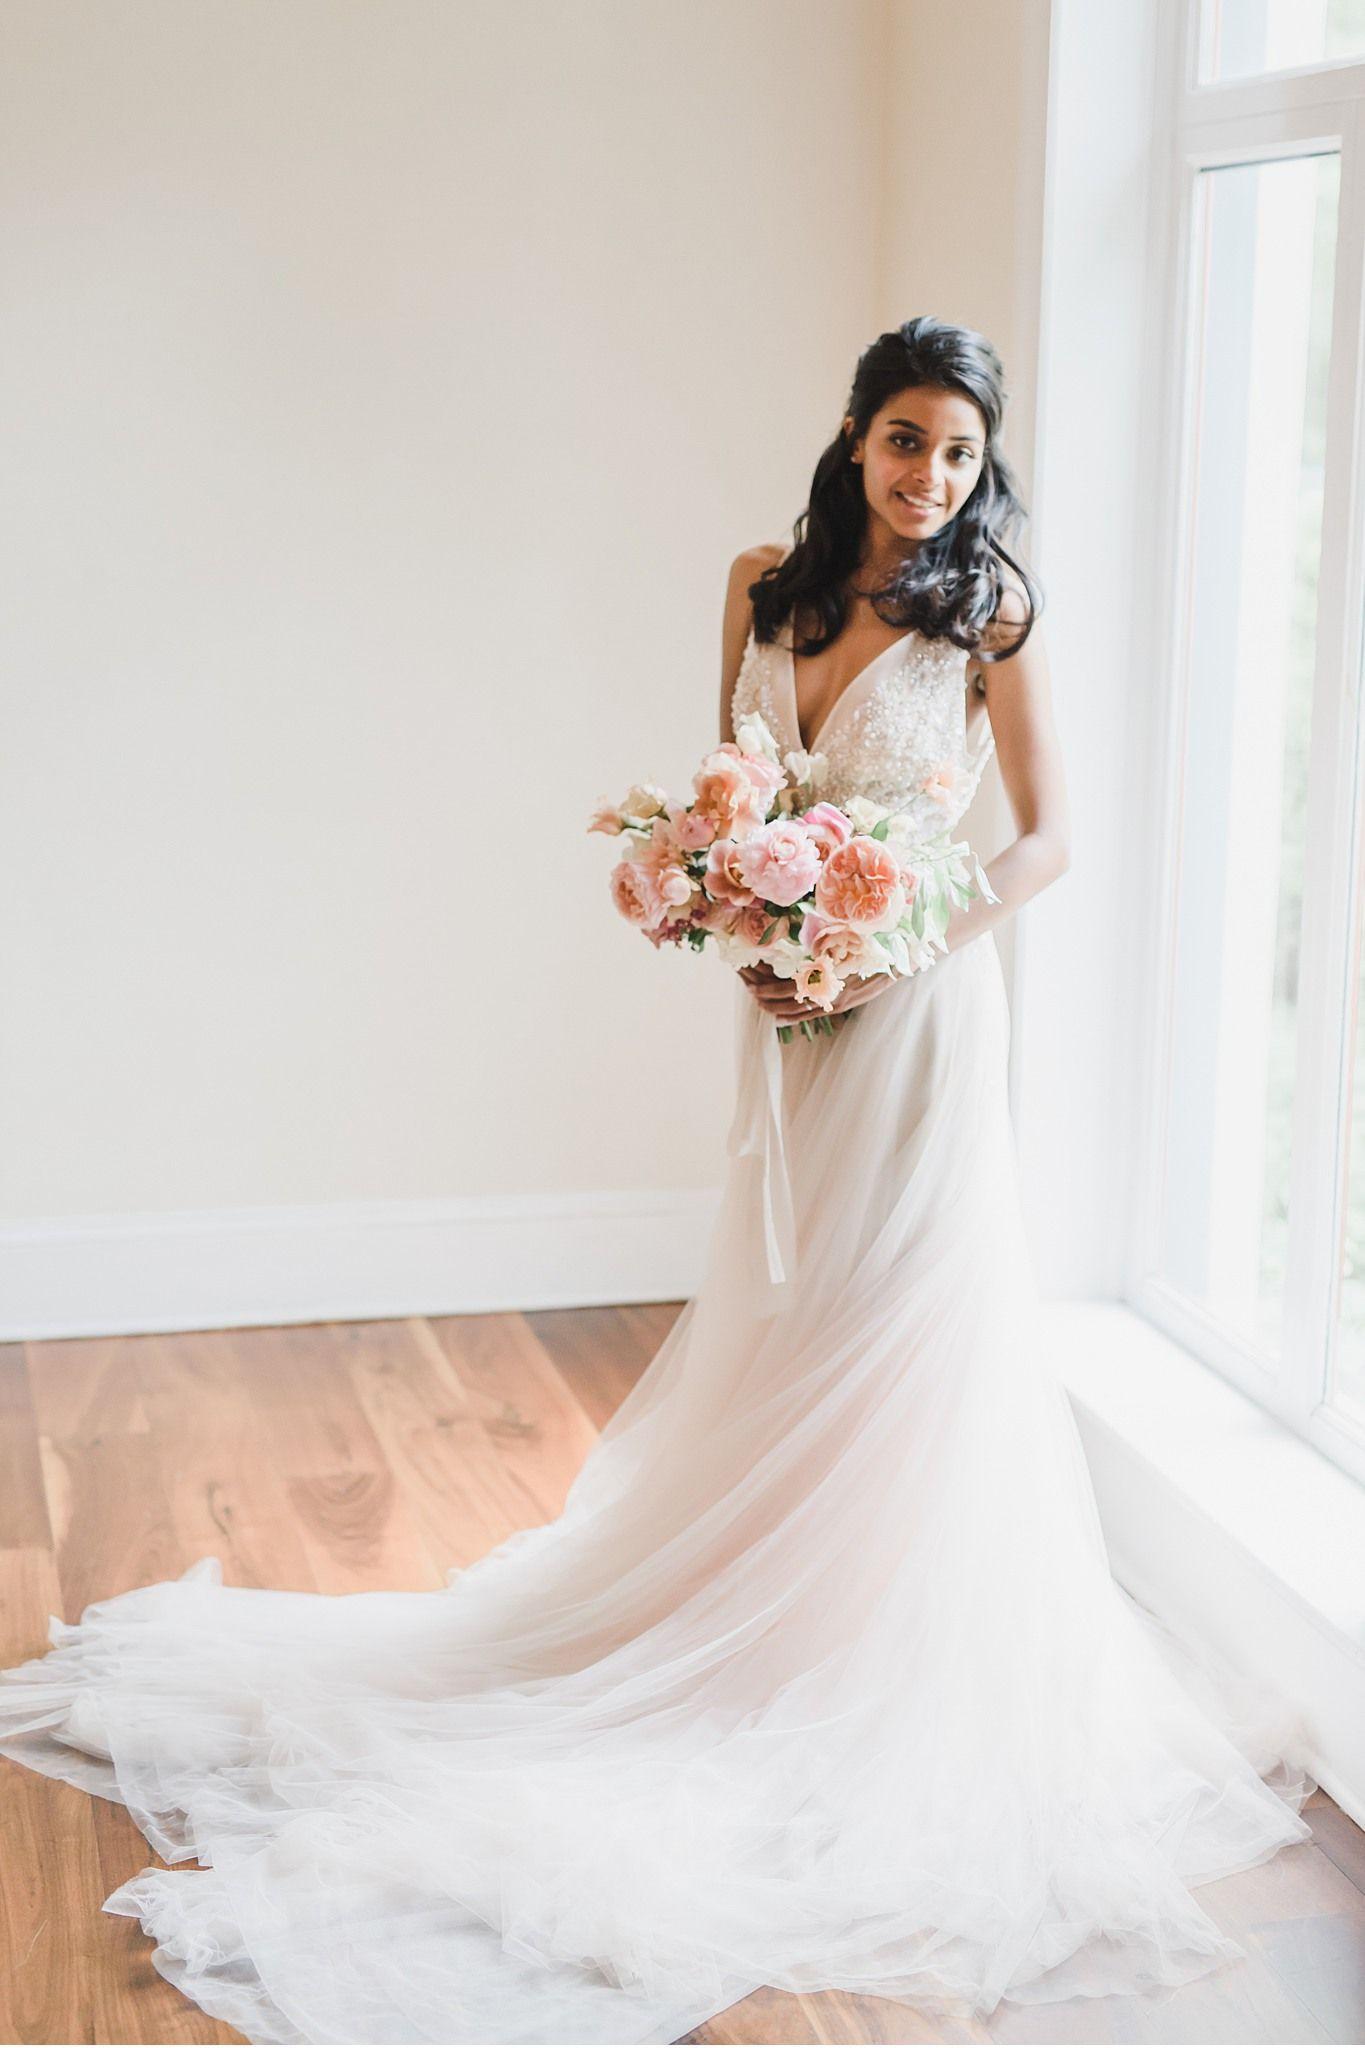 Blush Florals At Styled Wedding At Pomme Philadelphia Pa Fairy Tale Wedding Dress Bling Wedding Dress Wedding Dress Long Sleeve [ 2048 x 1365 Pixel ]